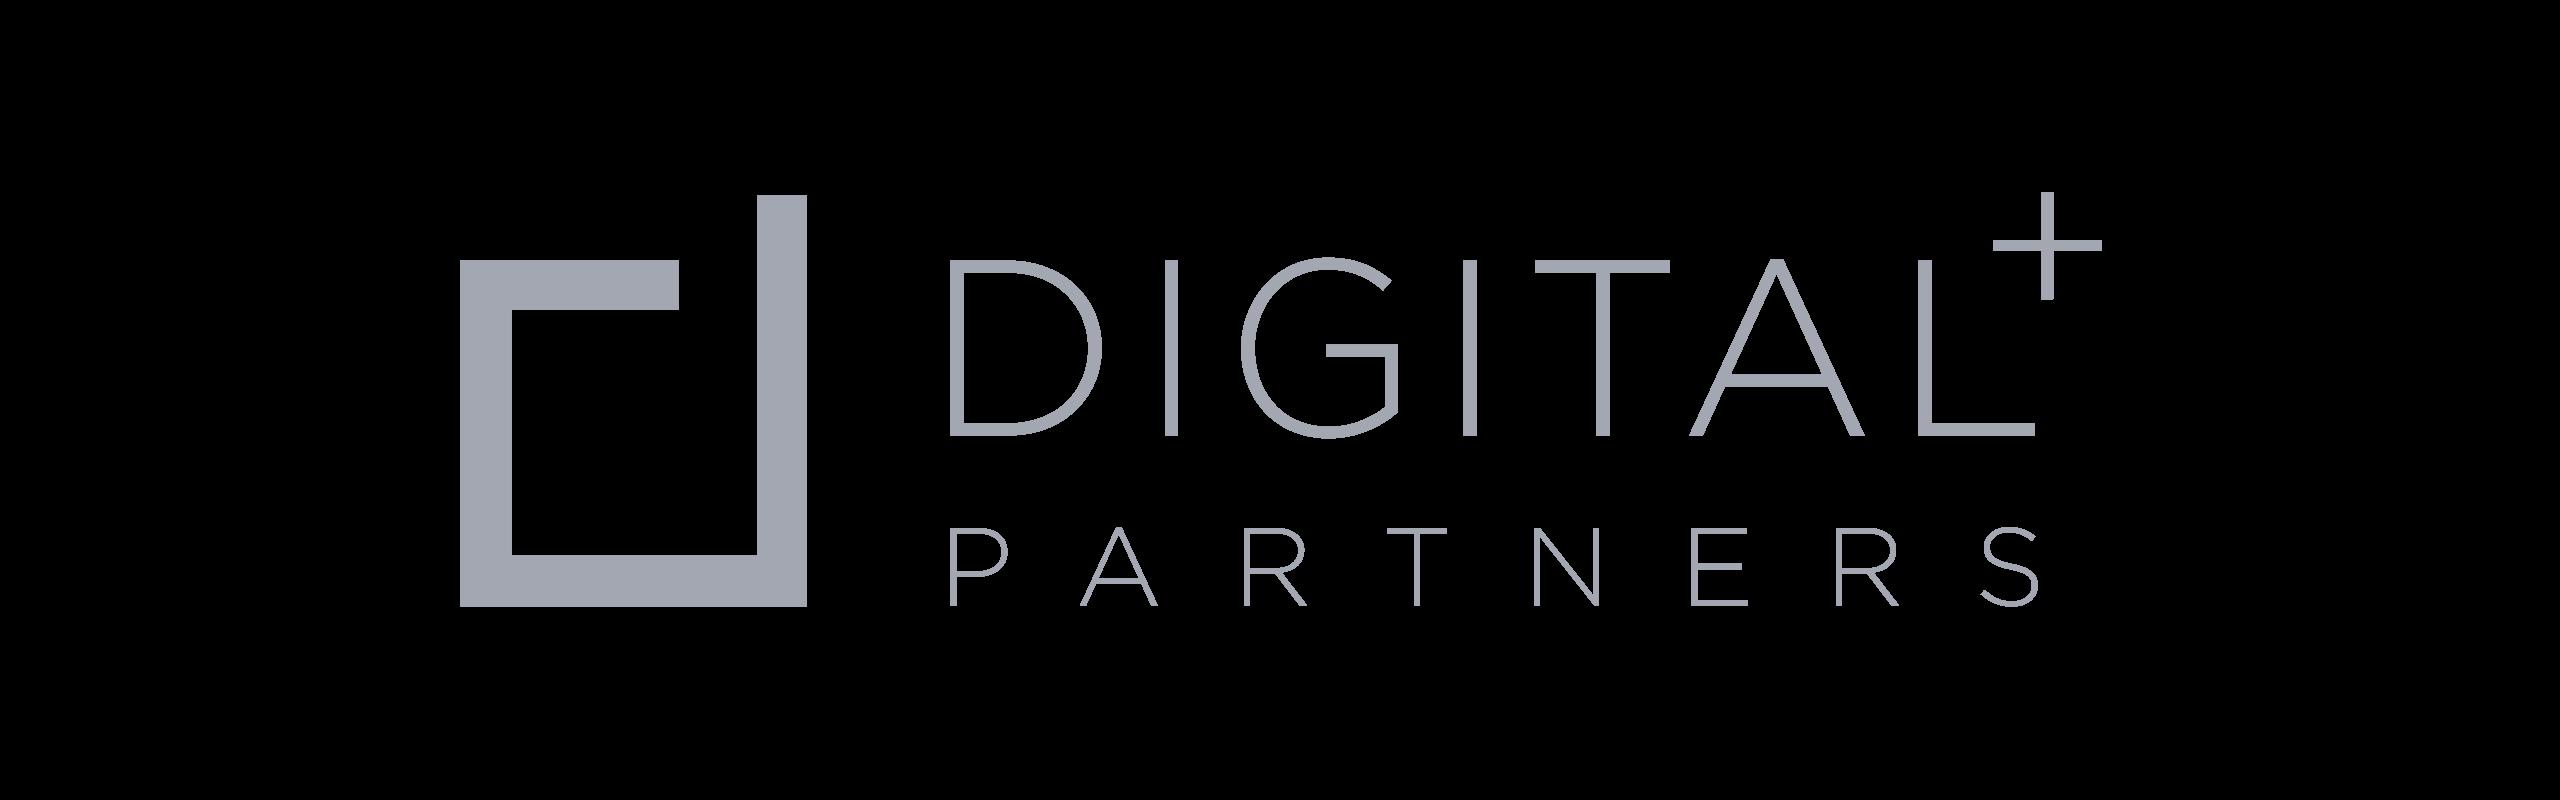 Technology & product due diligence | Code & Co. advises DIGITAL PLUS PARTNERS (logo shown)